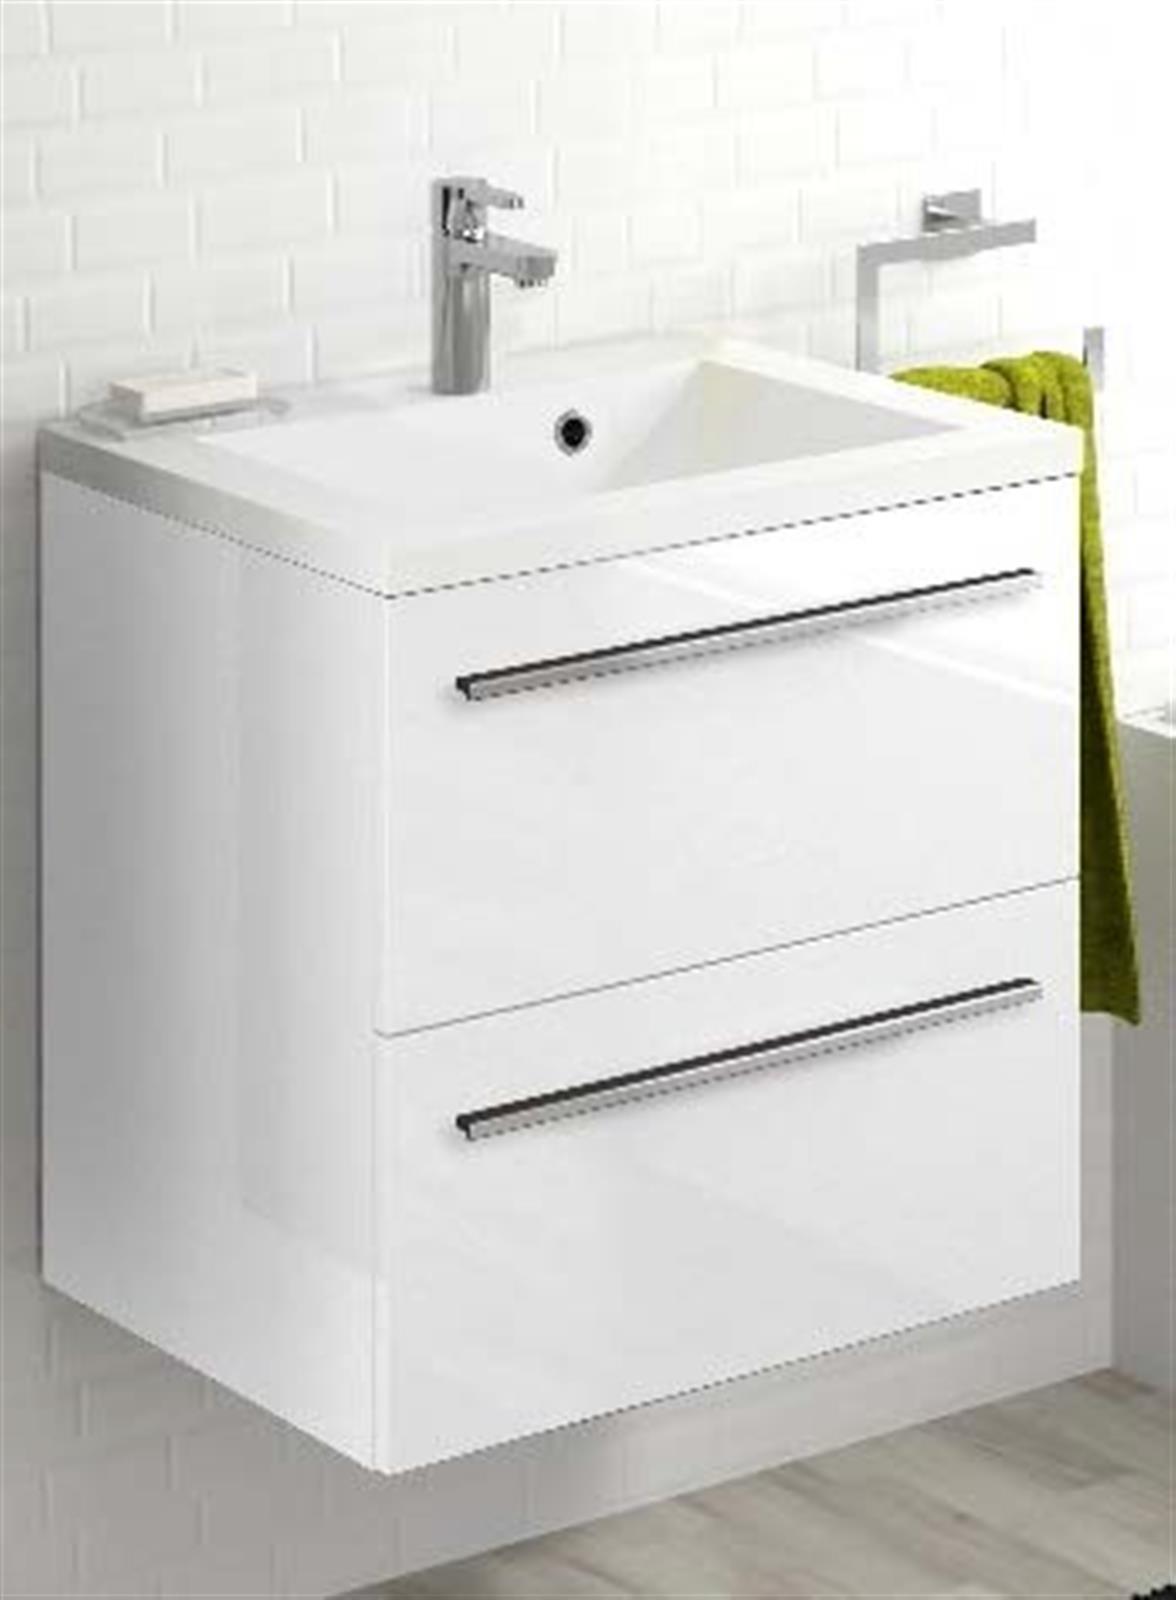 Meuble sous vasque 2 tiroirs 60 cm s rie adesio 3 - Vide sanitaire meuble cuisine ...